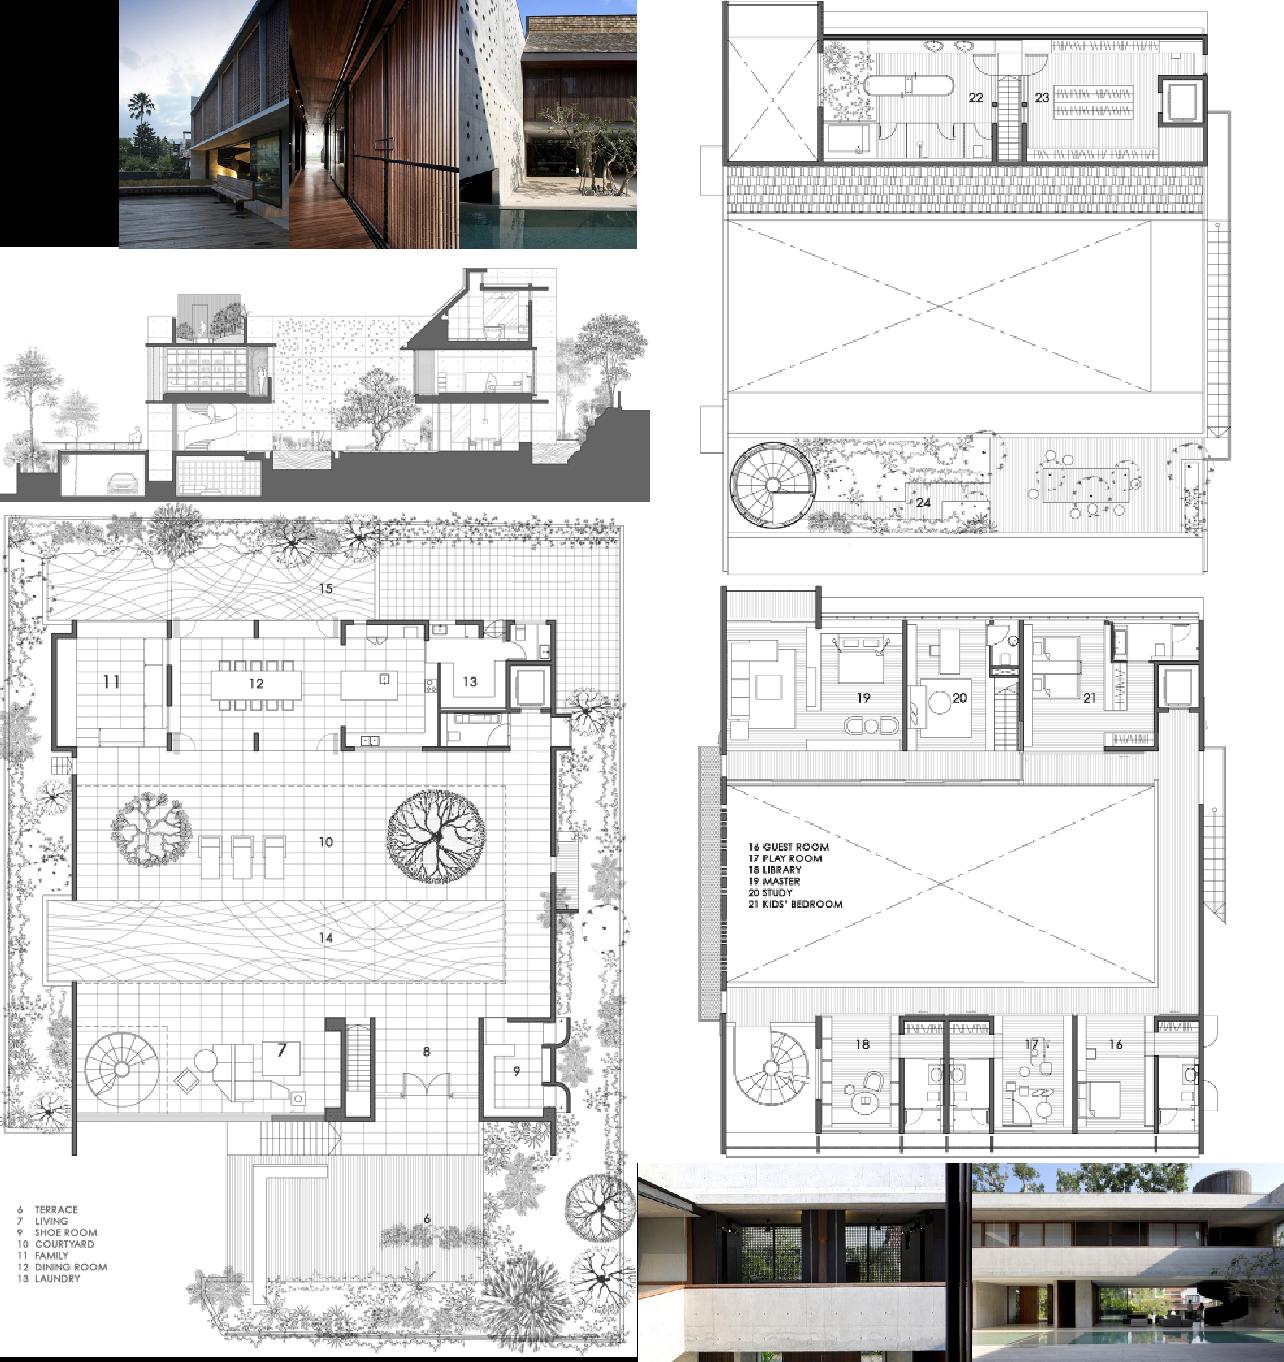 Courtyard House By Formwerkz Architects Singapore Courtyard House House Plans Floor Plans